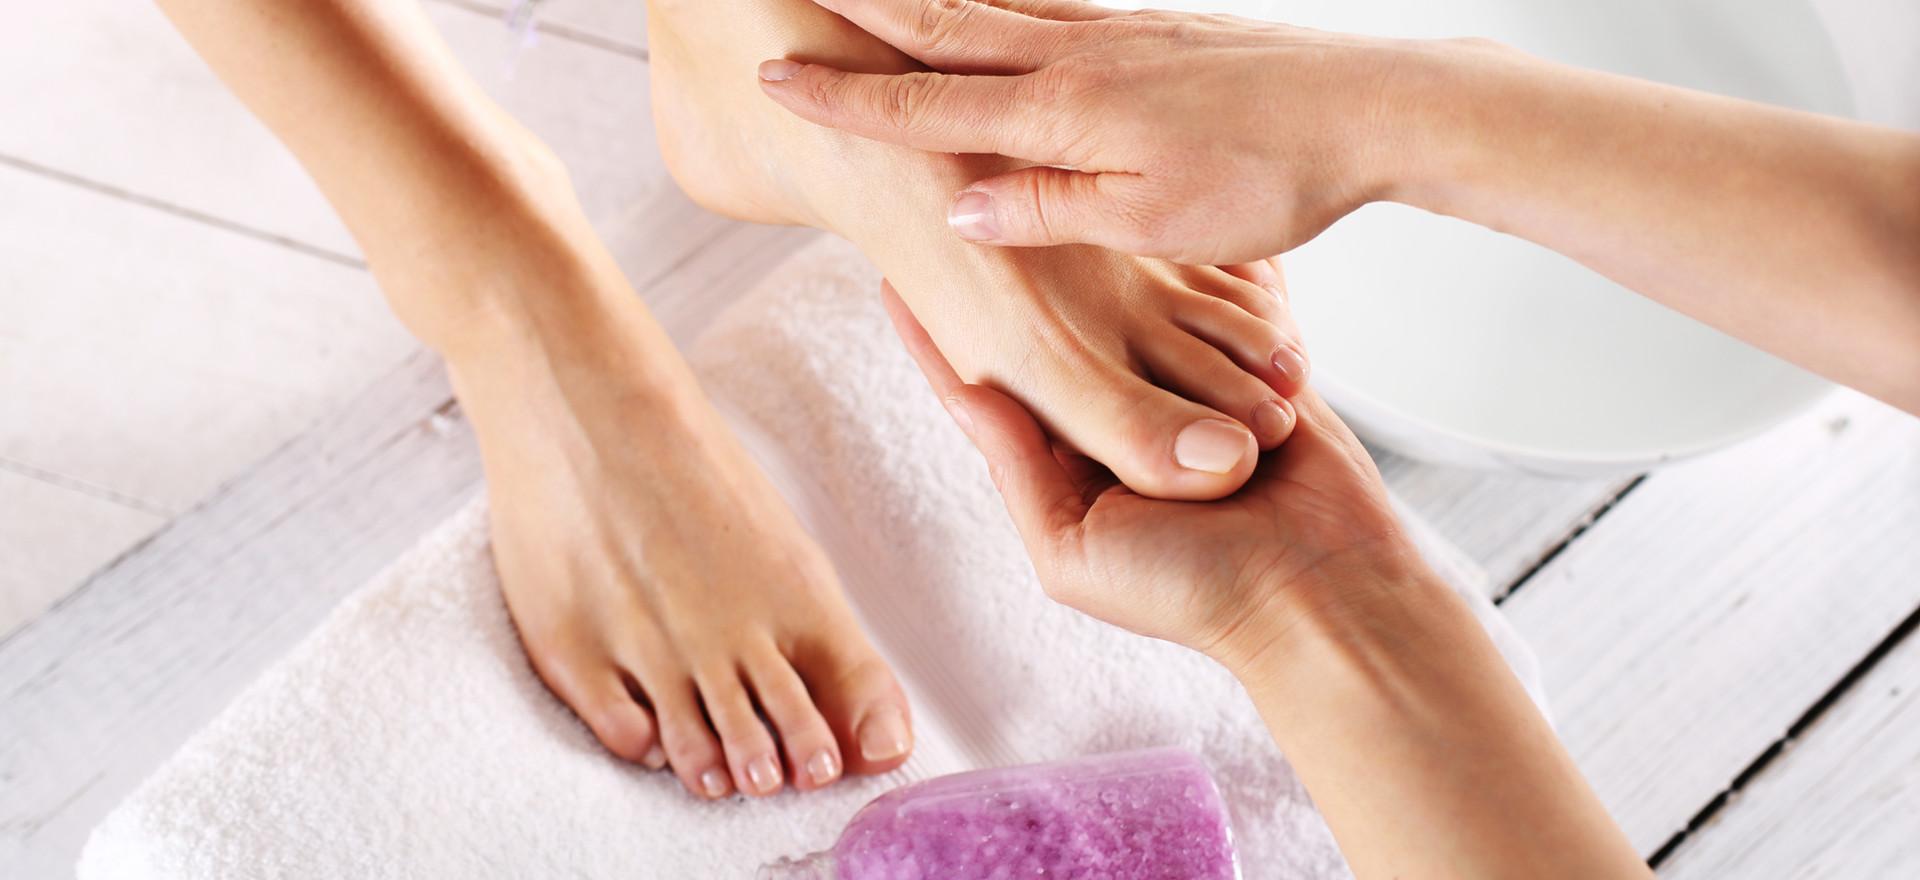 Massage pieds, mains, tête